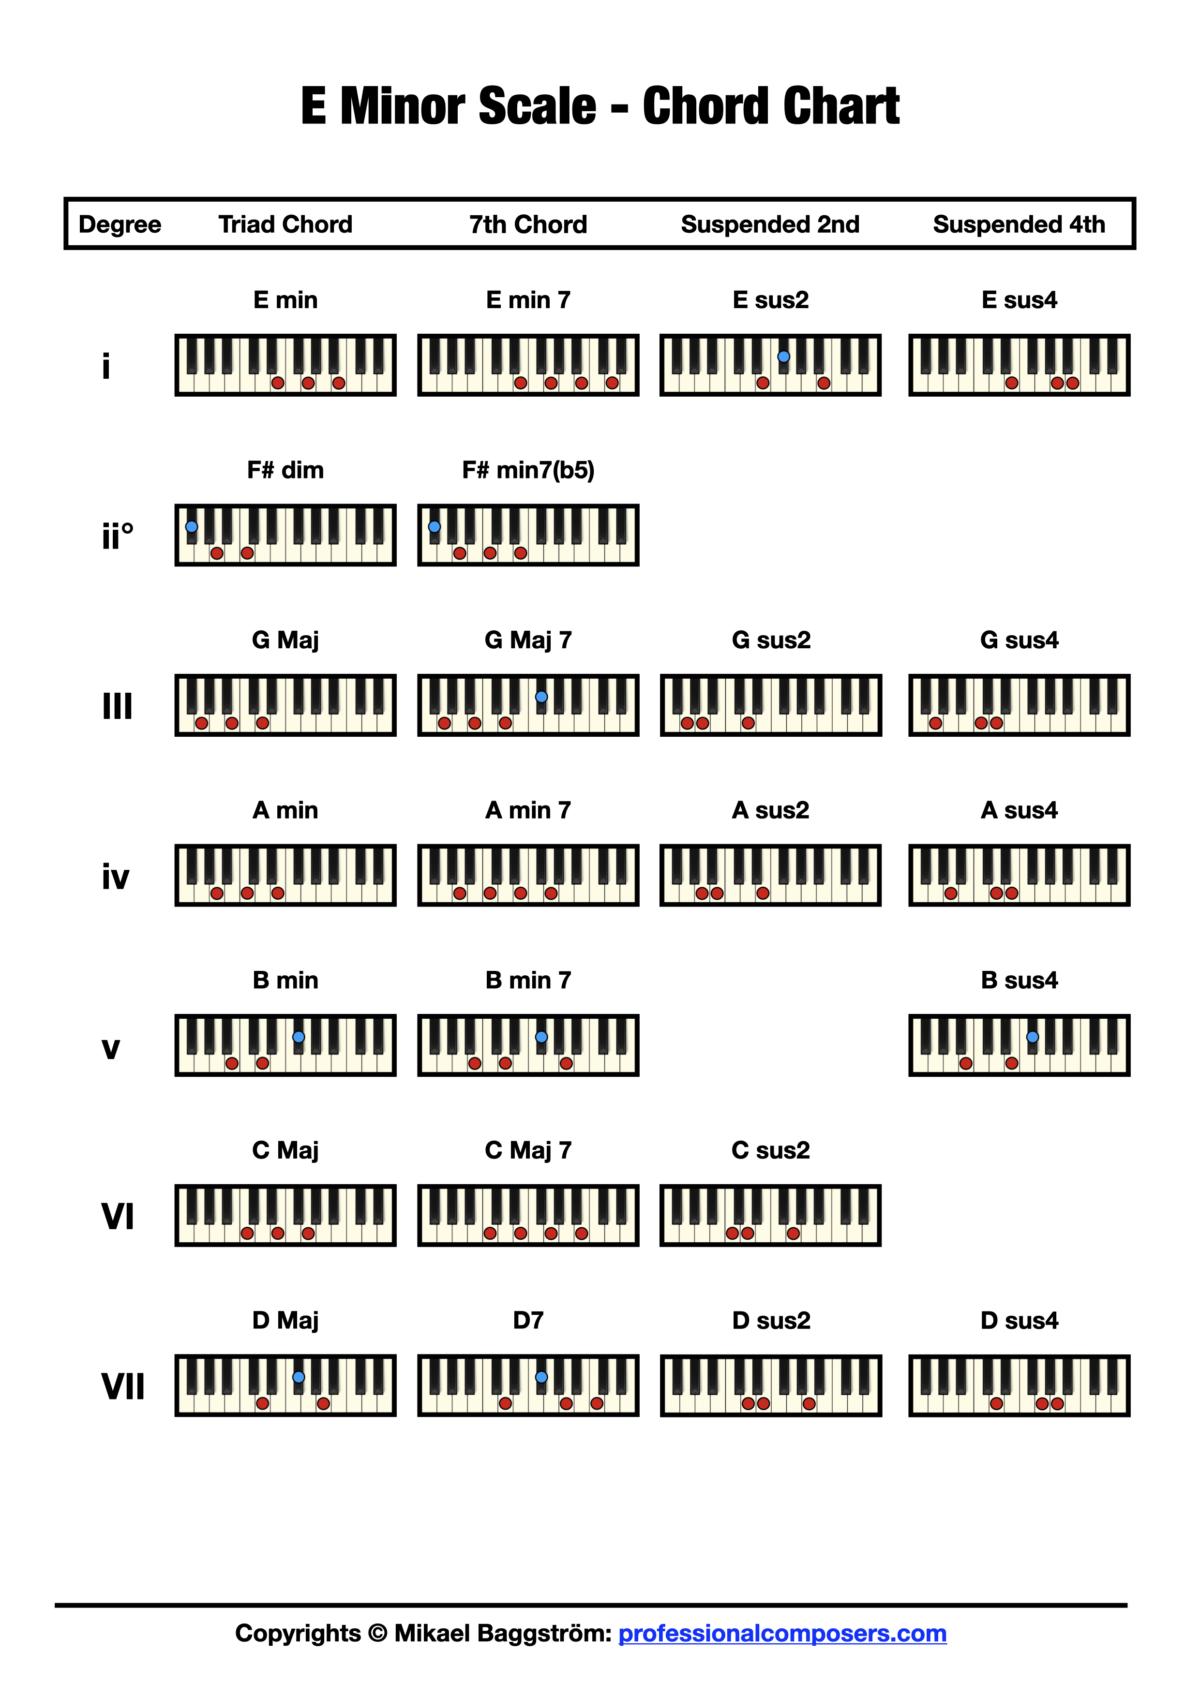 Chord Chart - E Minor Scale